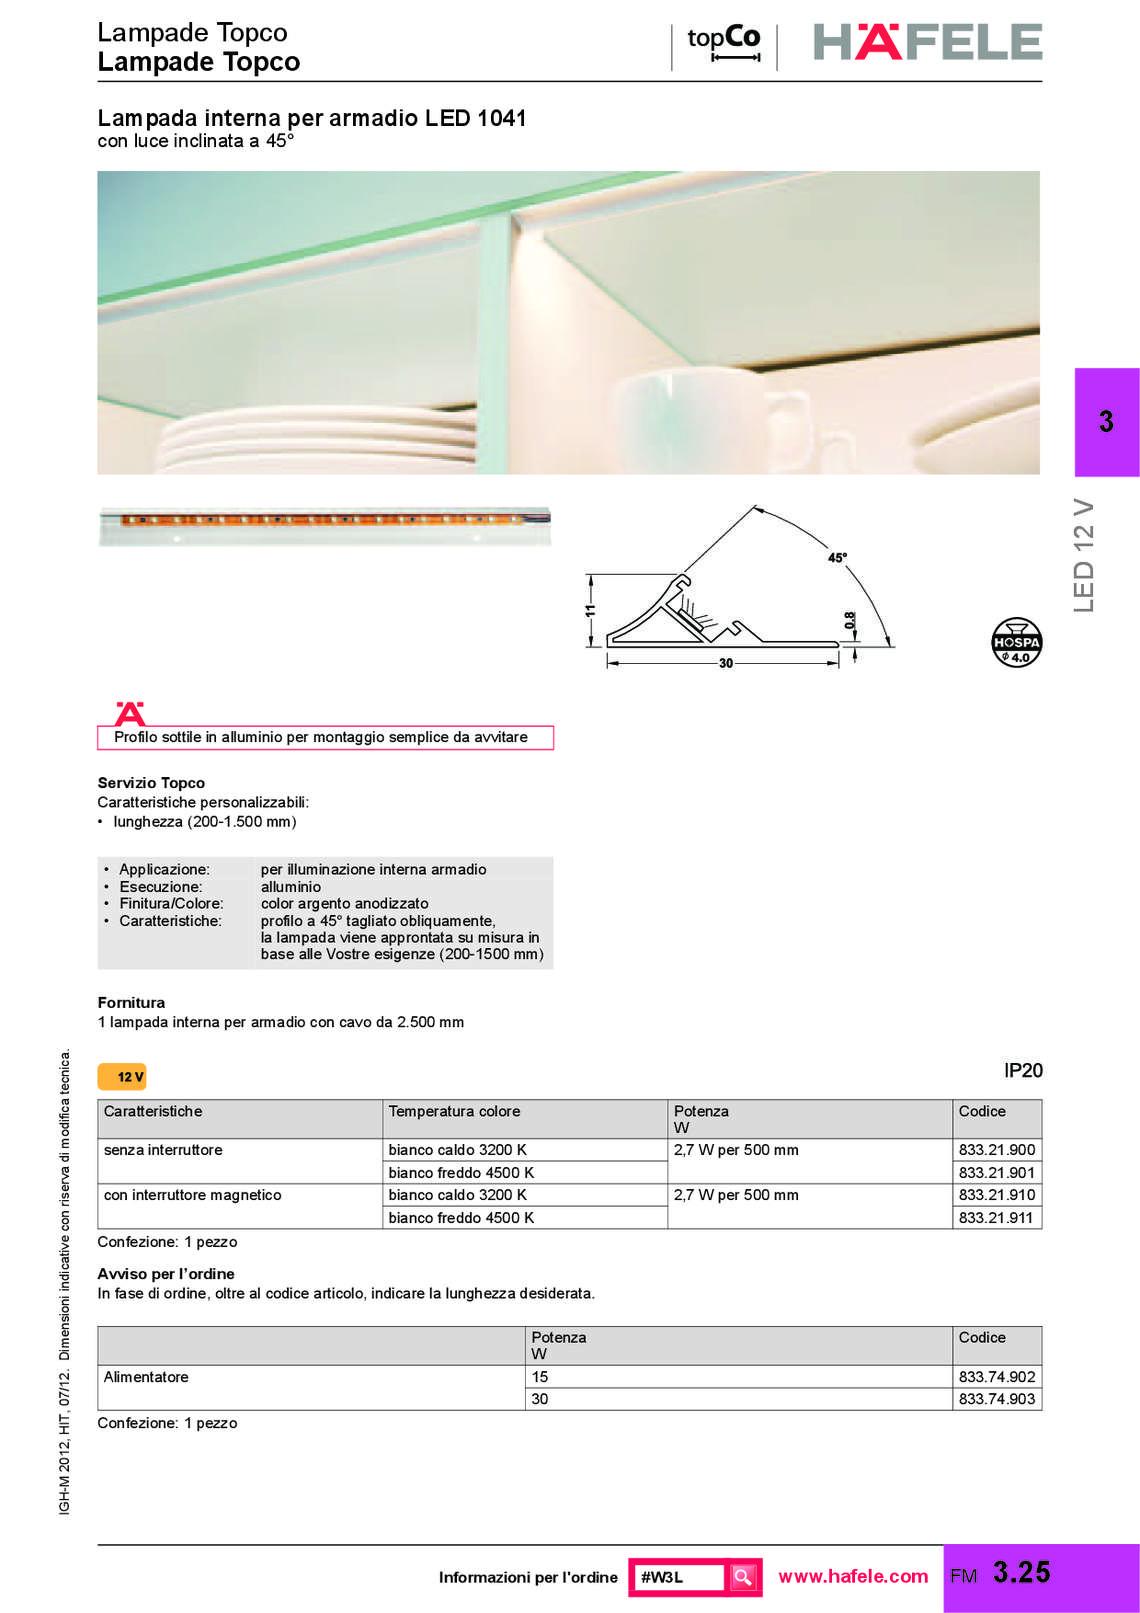 hafele-prodotti-su-misura_81_038.jpg